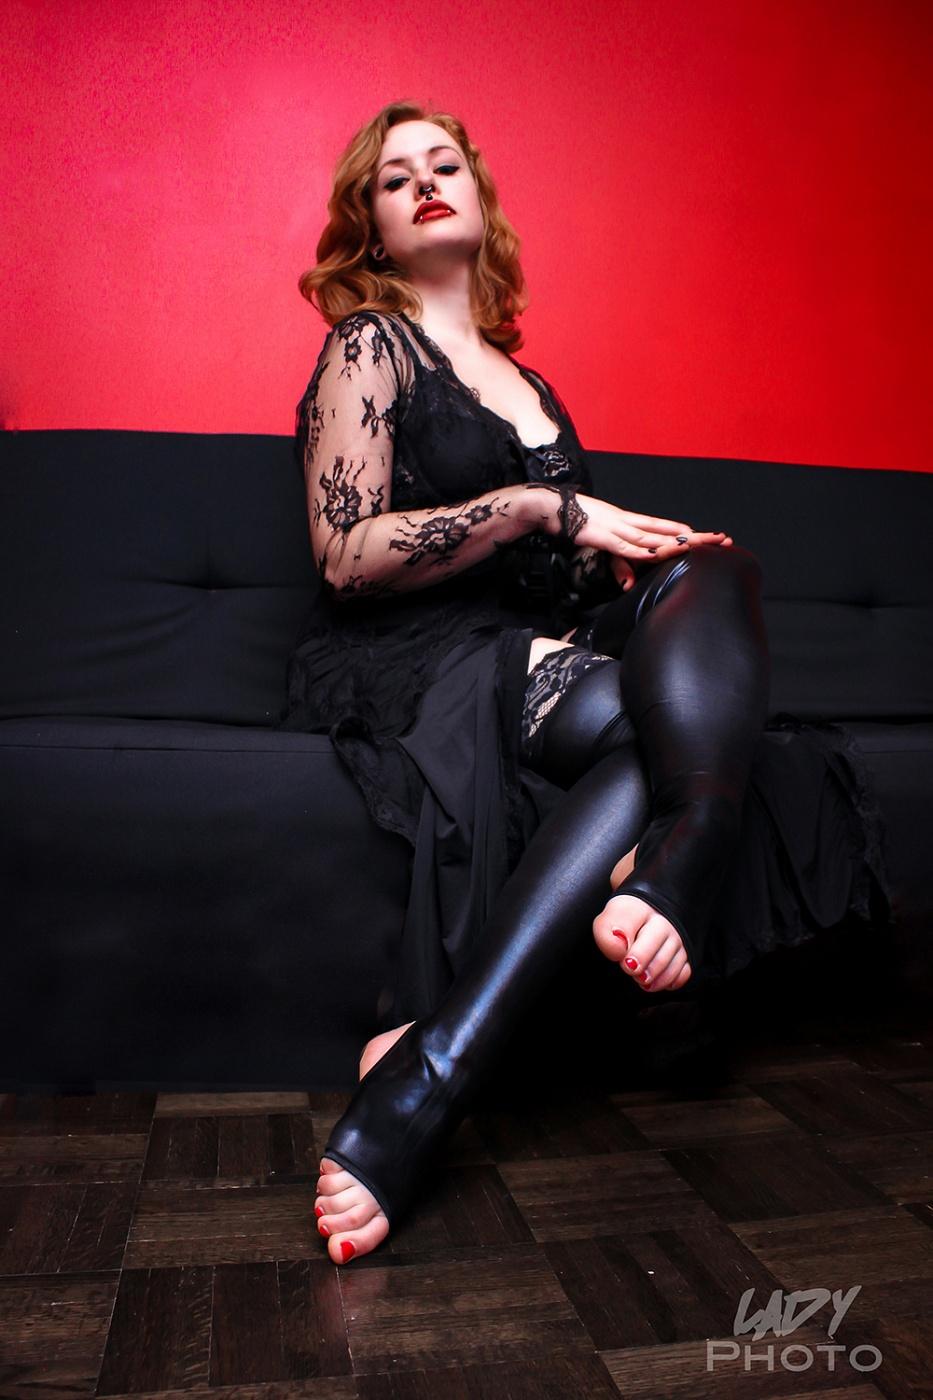 Mistress Margot